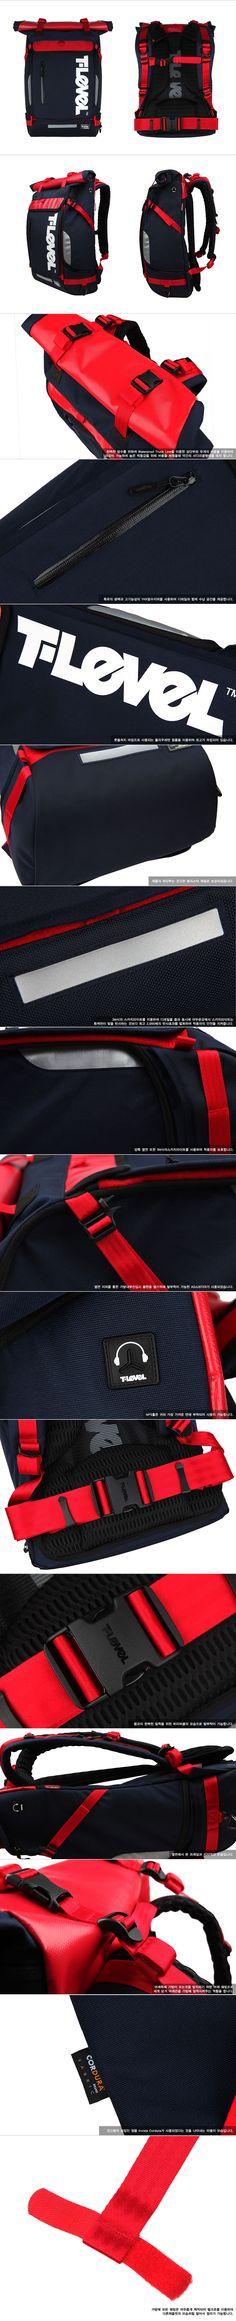 T Level rolltop bag...check!! :D